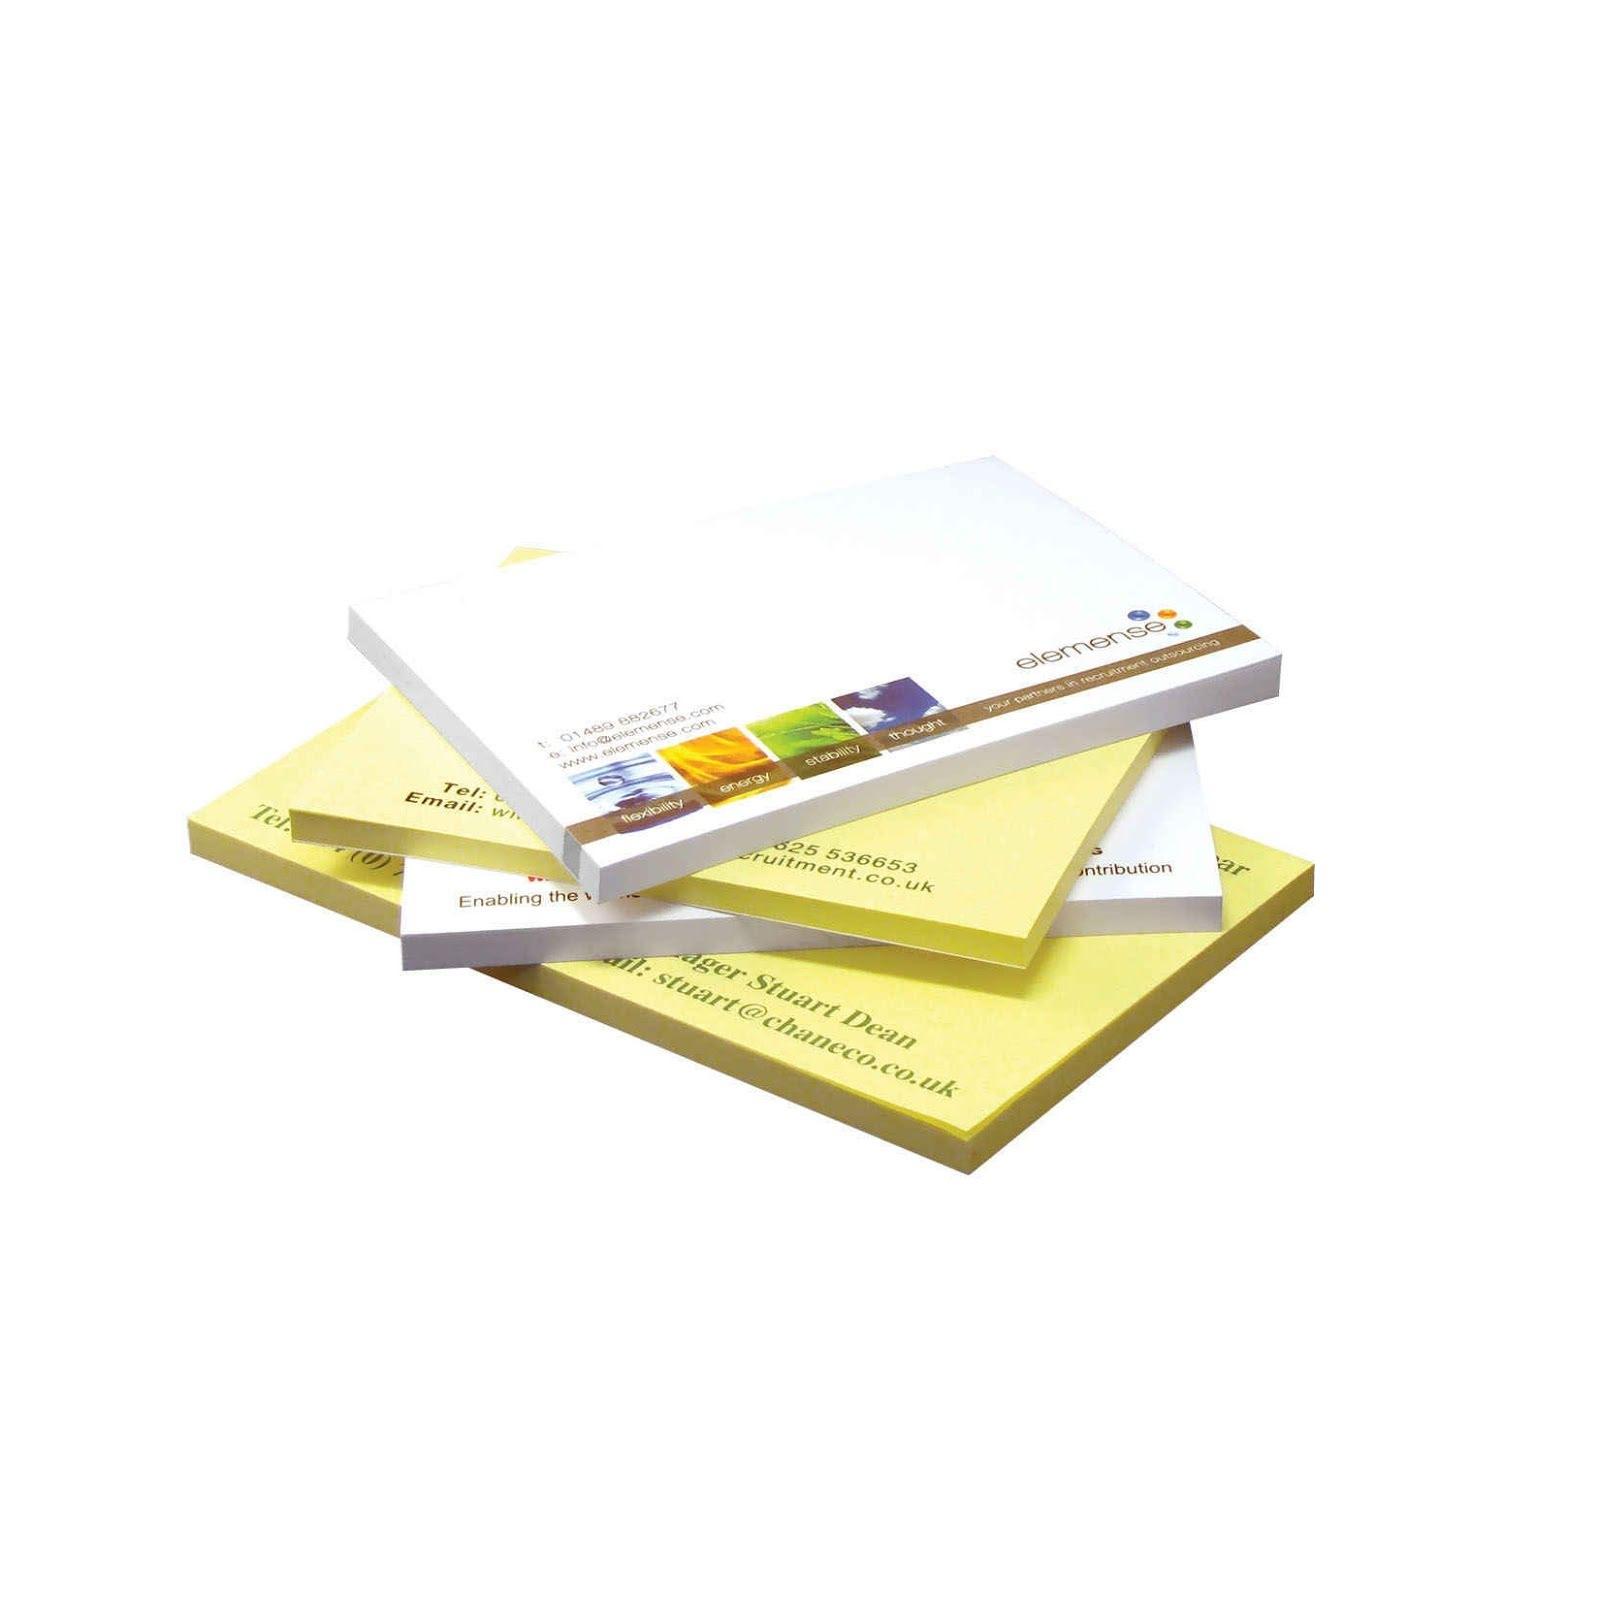 Recycled Sticky Notes Branded